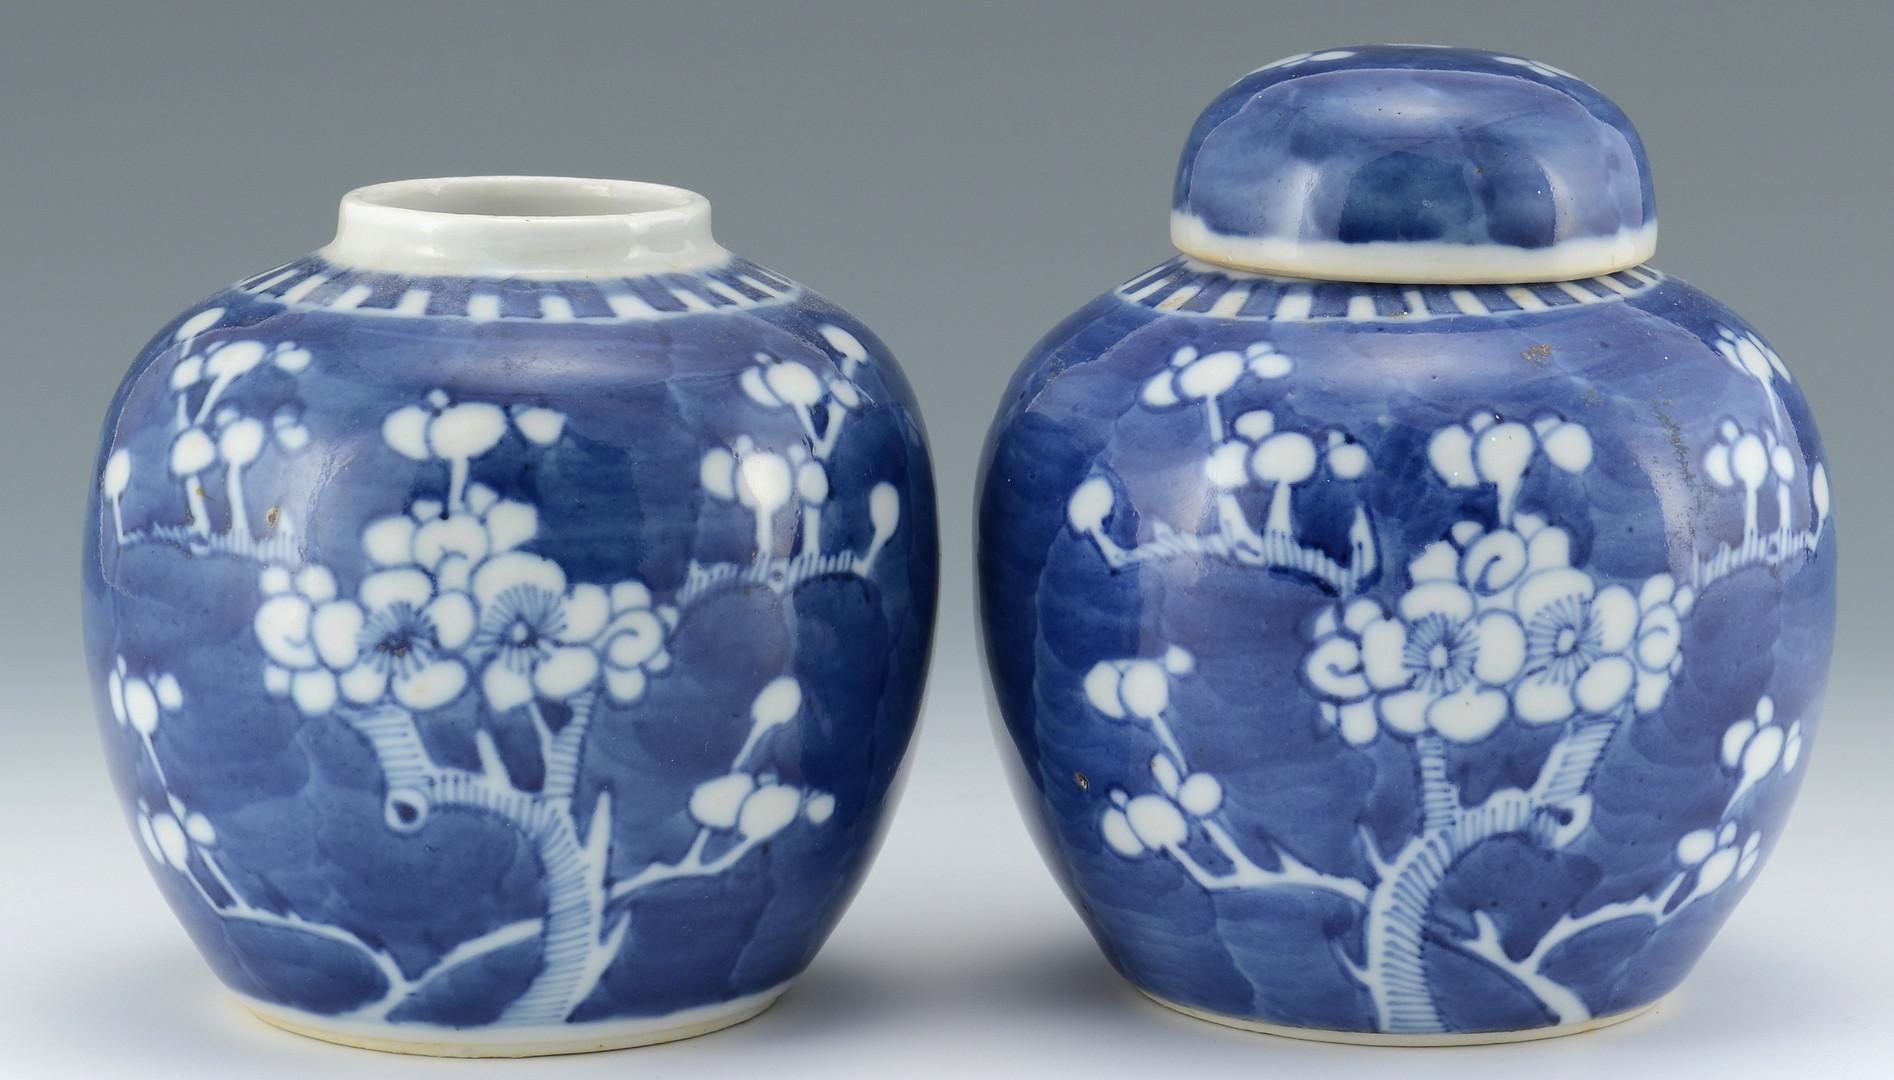 Lot 494: Chinese Hawthorne or Prunus Porcelain Jars